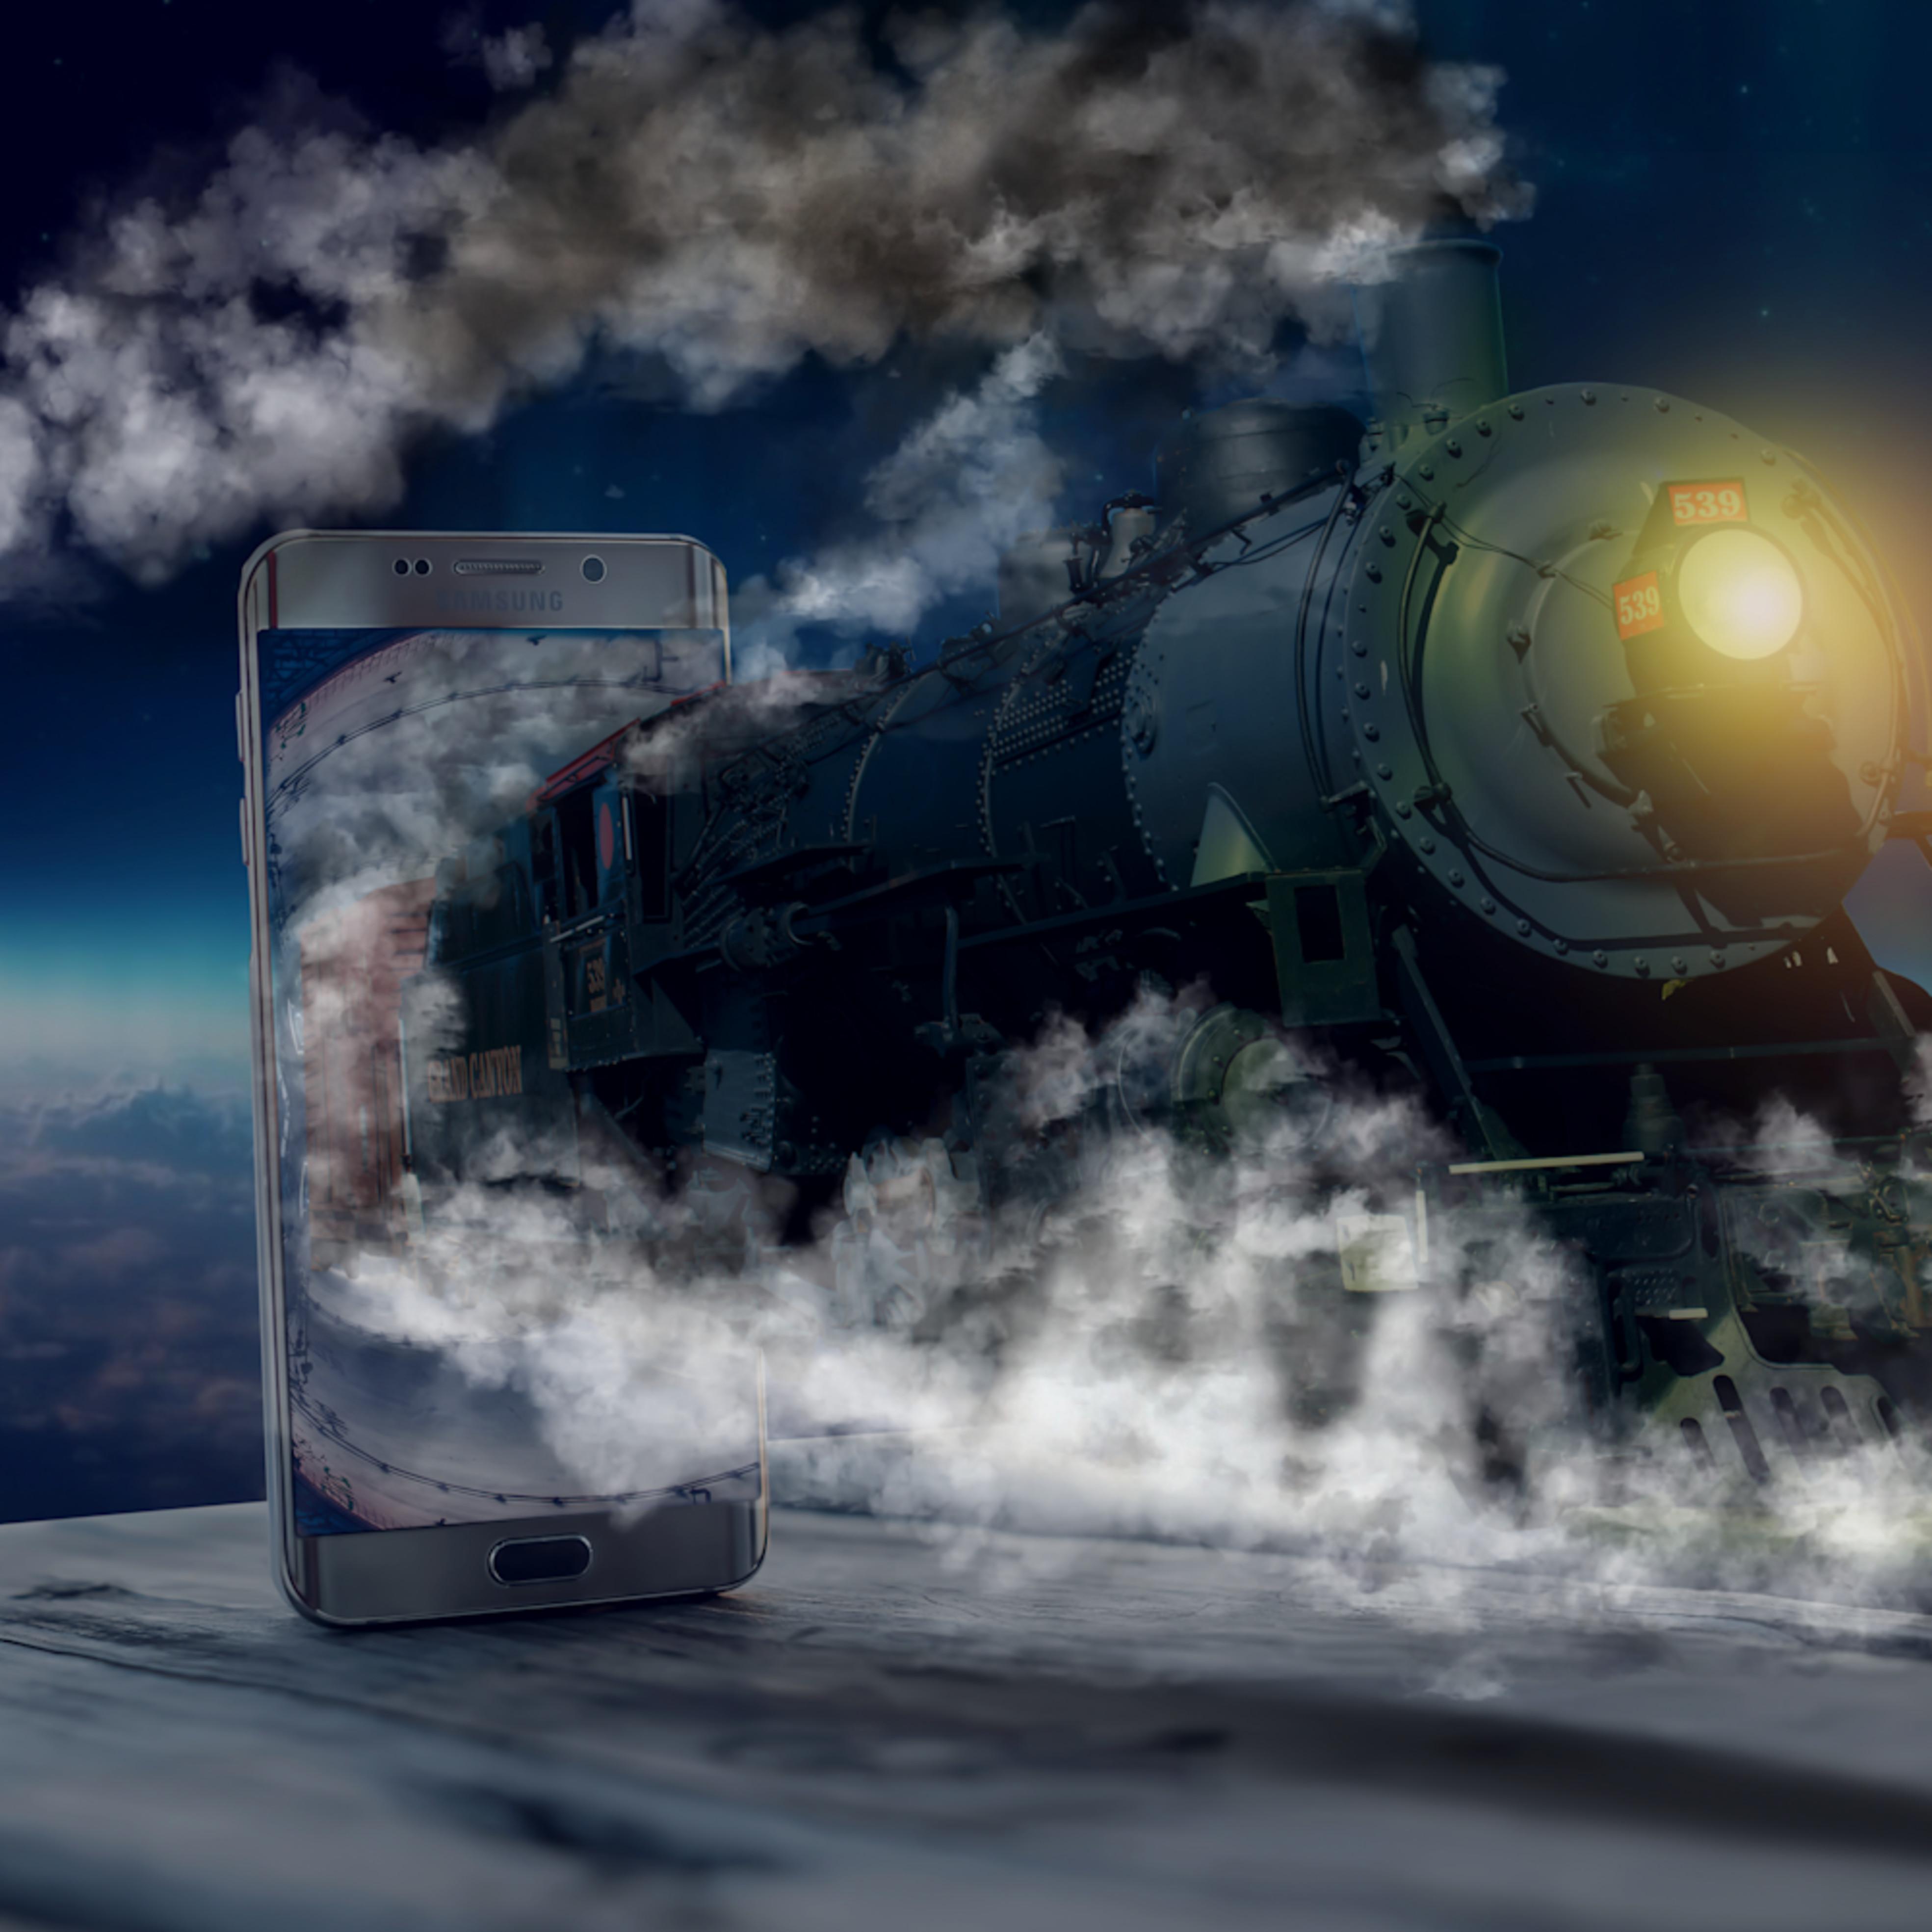 Space train lqz2i1